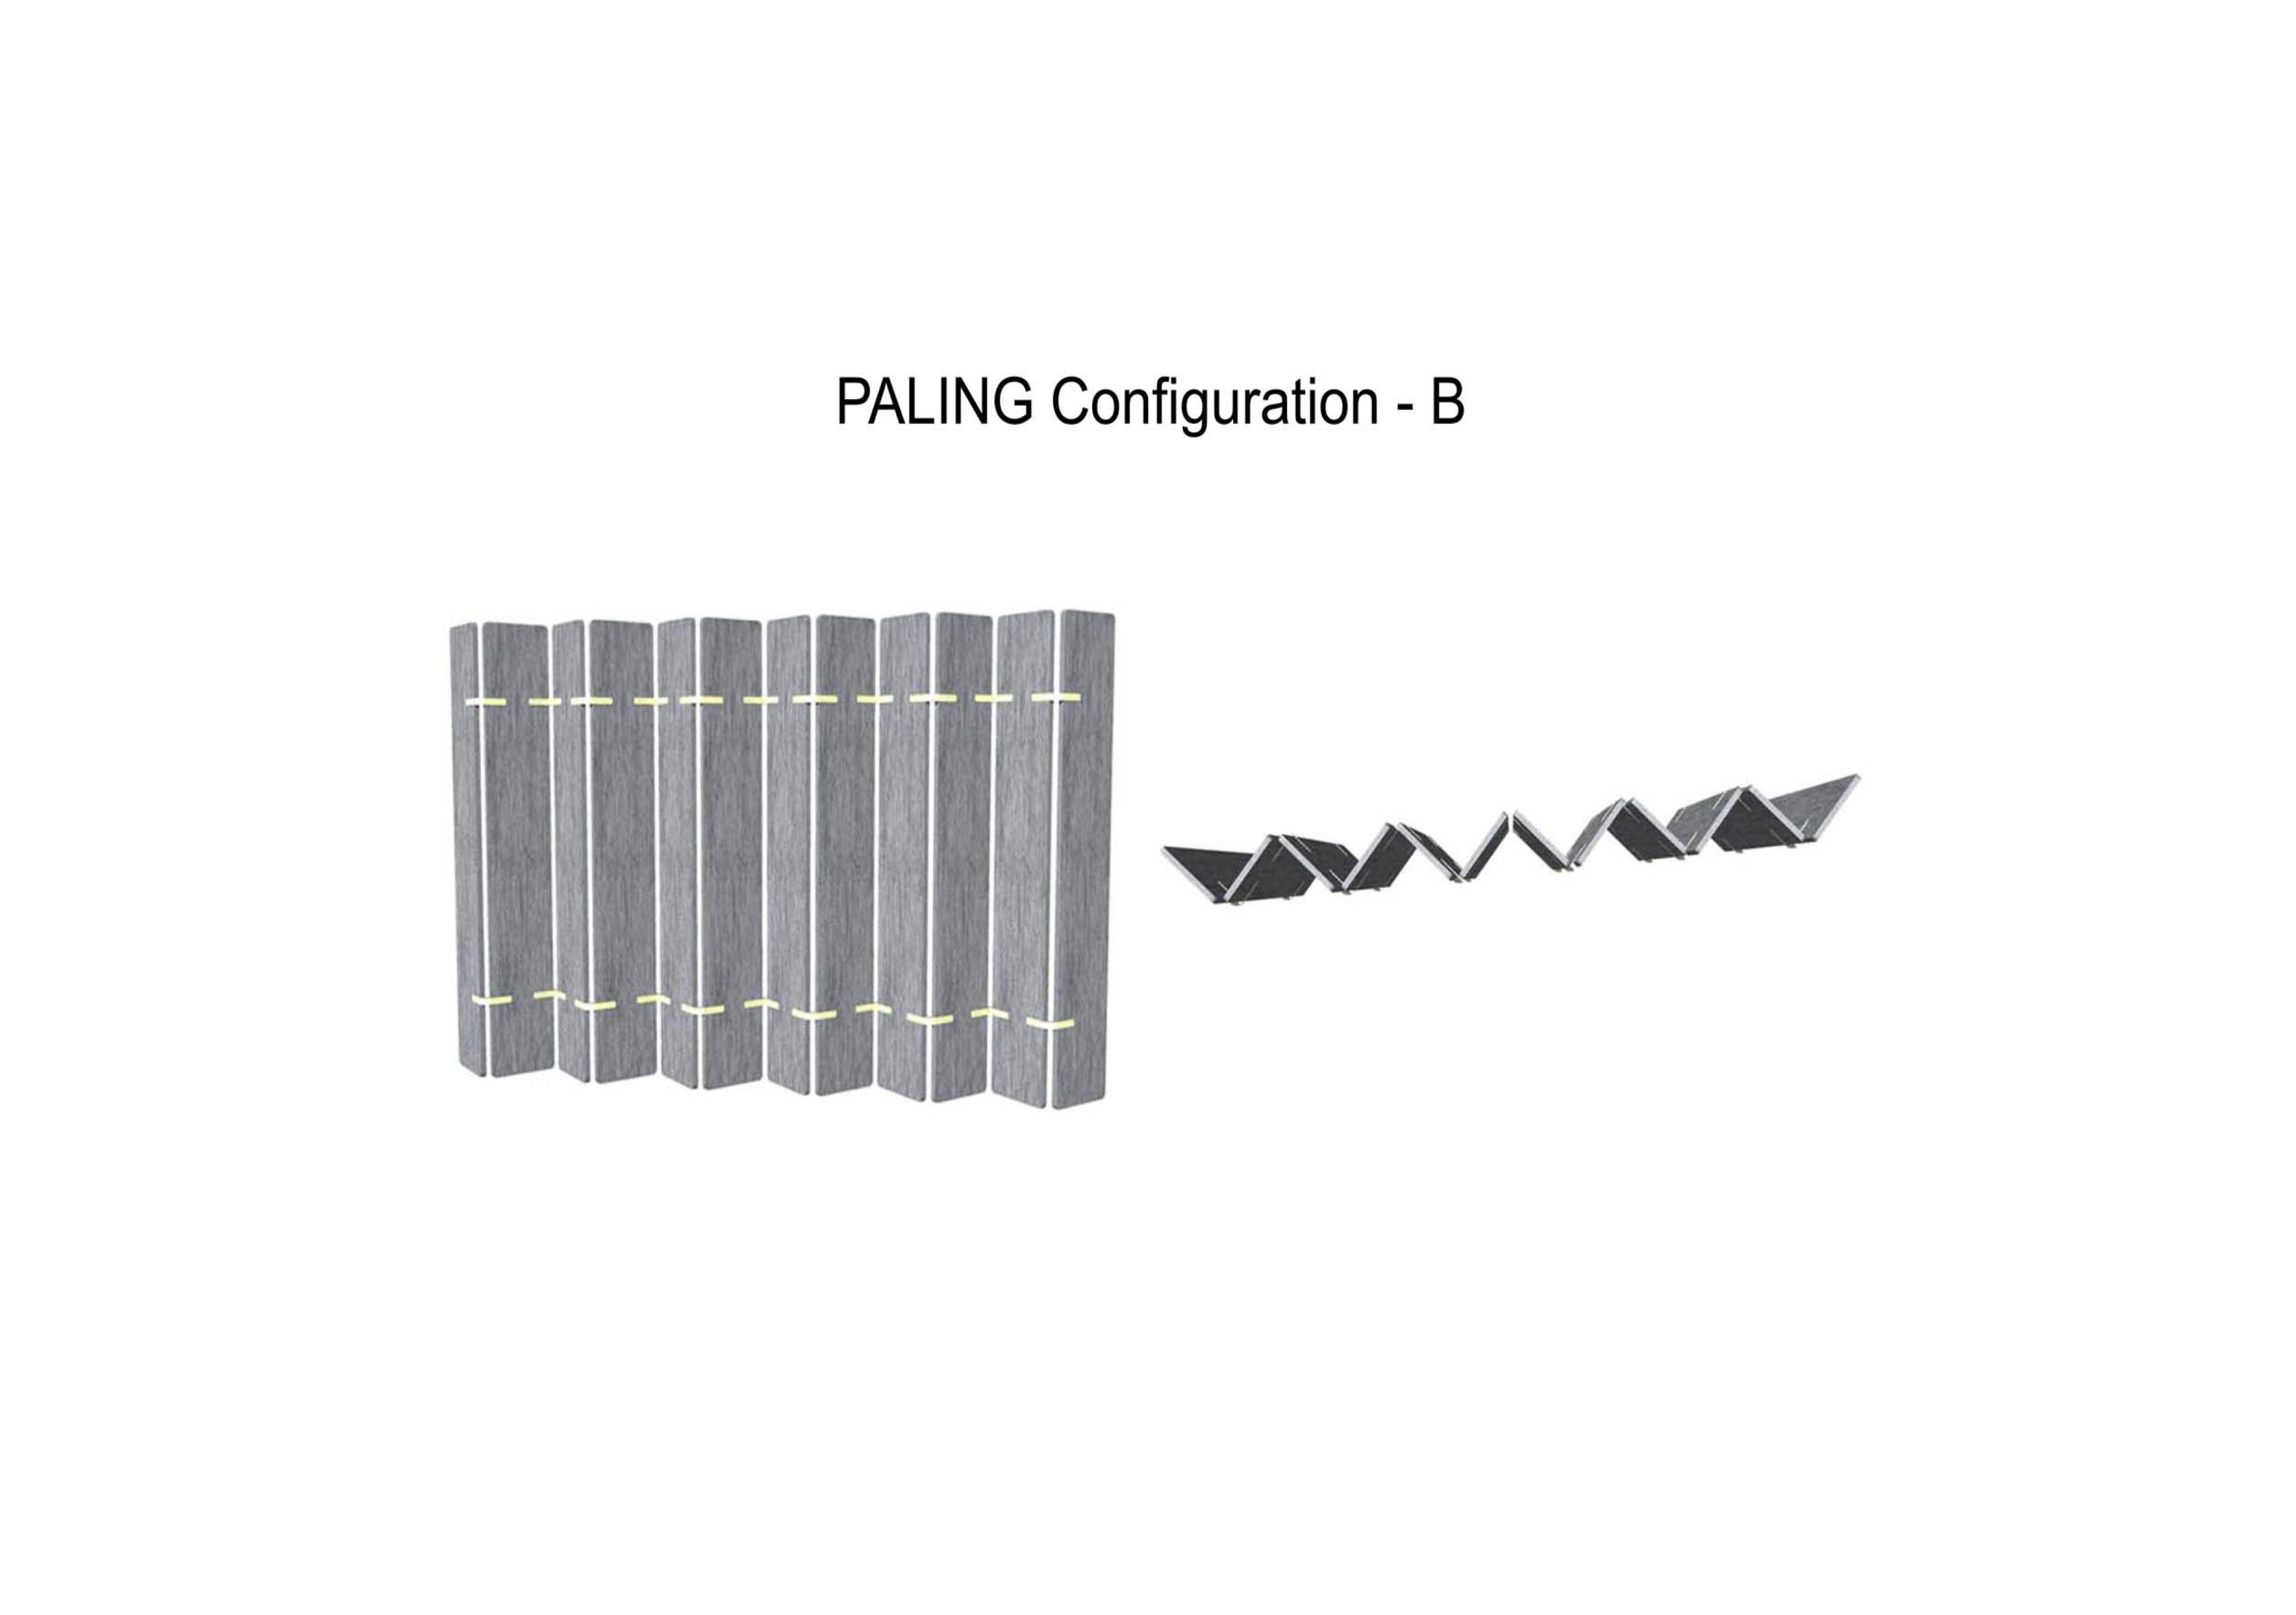 Paling Configuration 2